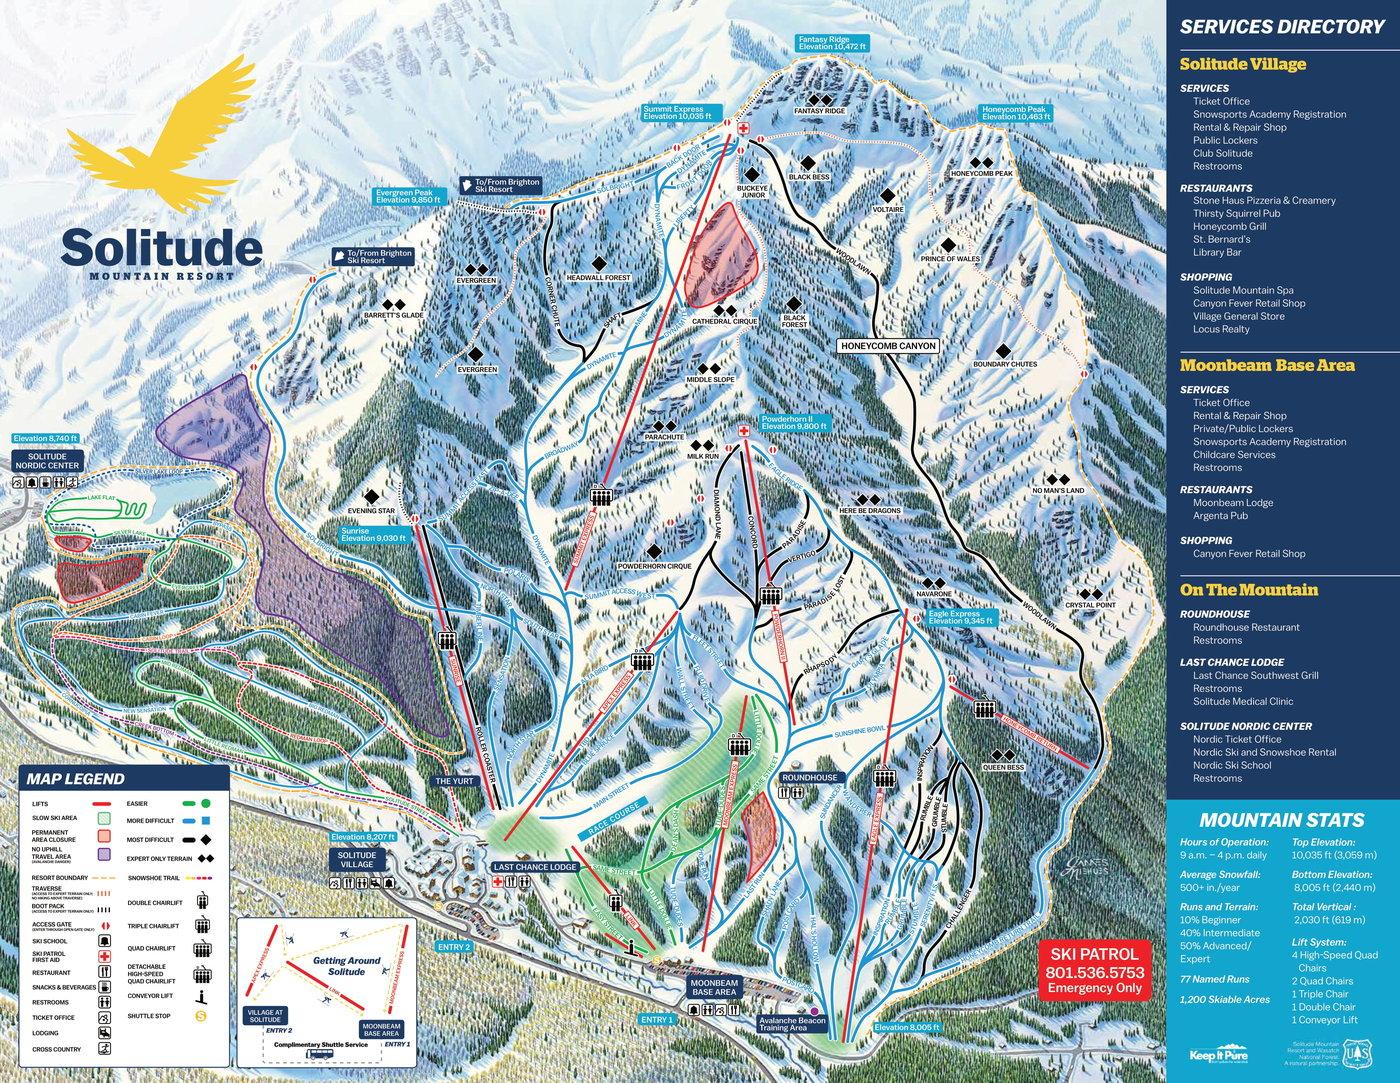 Solitude Mountain Resort Trail Map